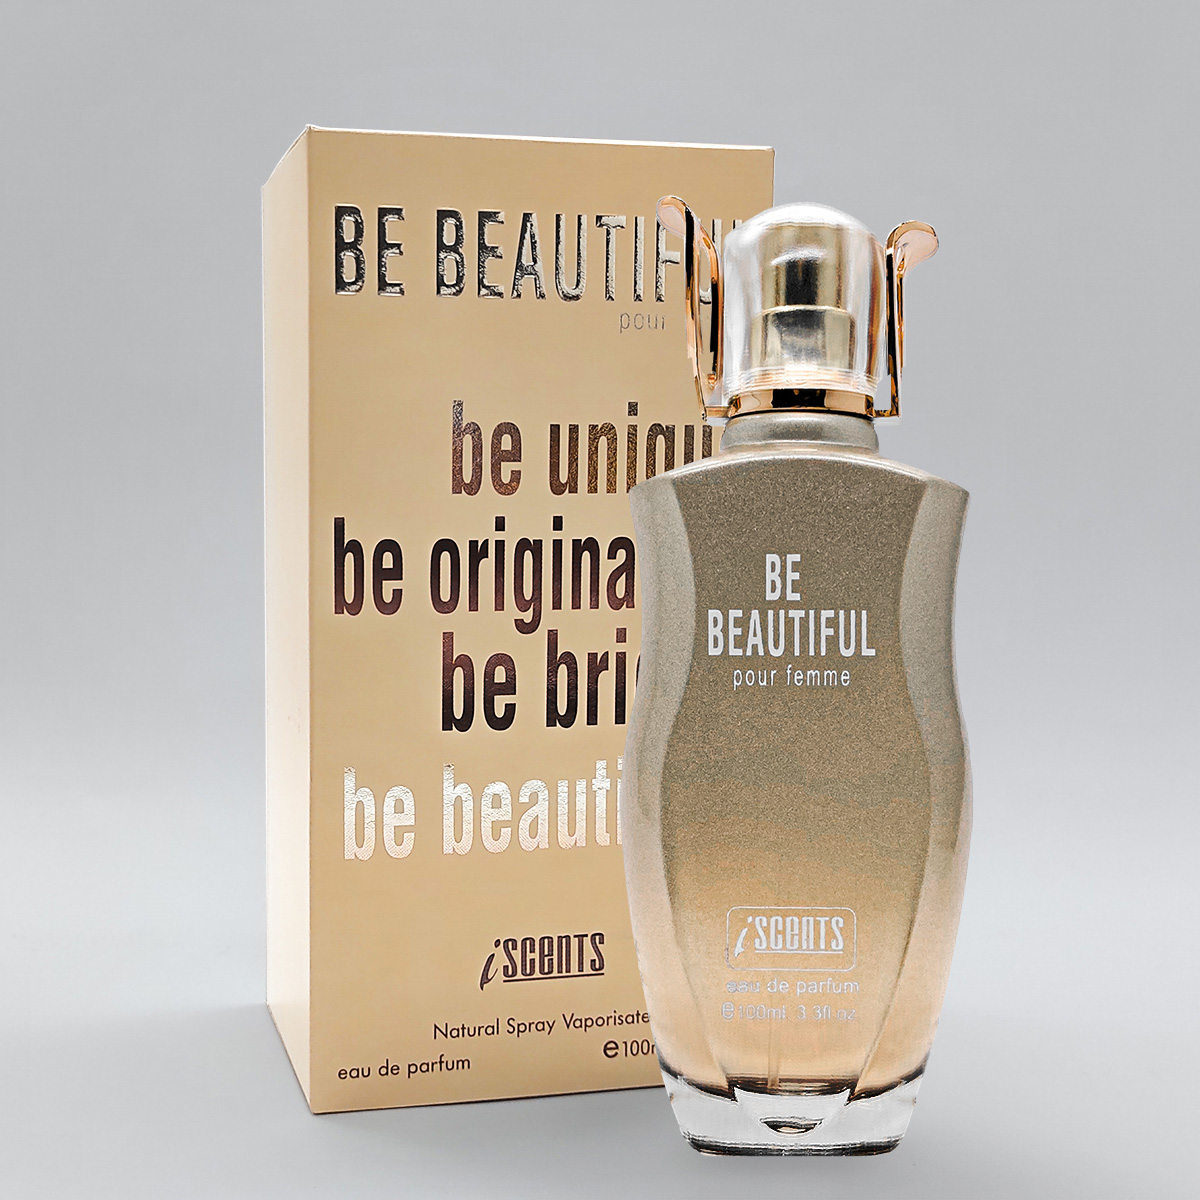 Perfume Be Beautiful F 100ml Edp - I Scents